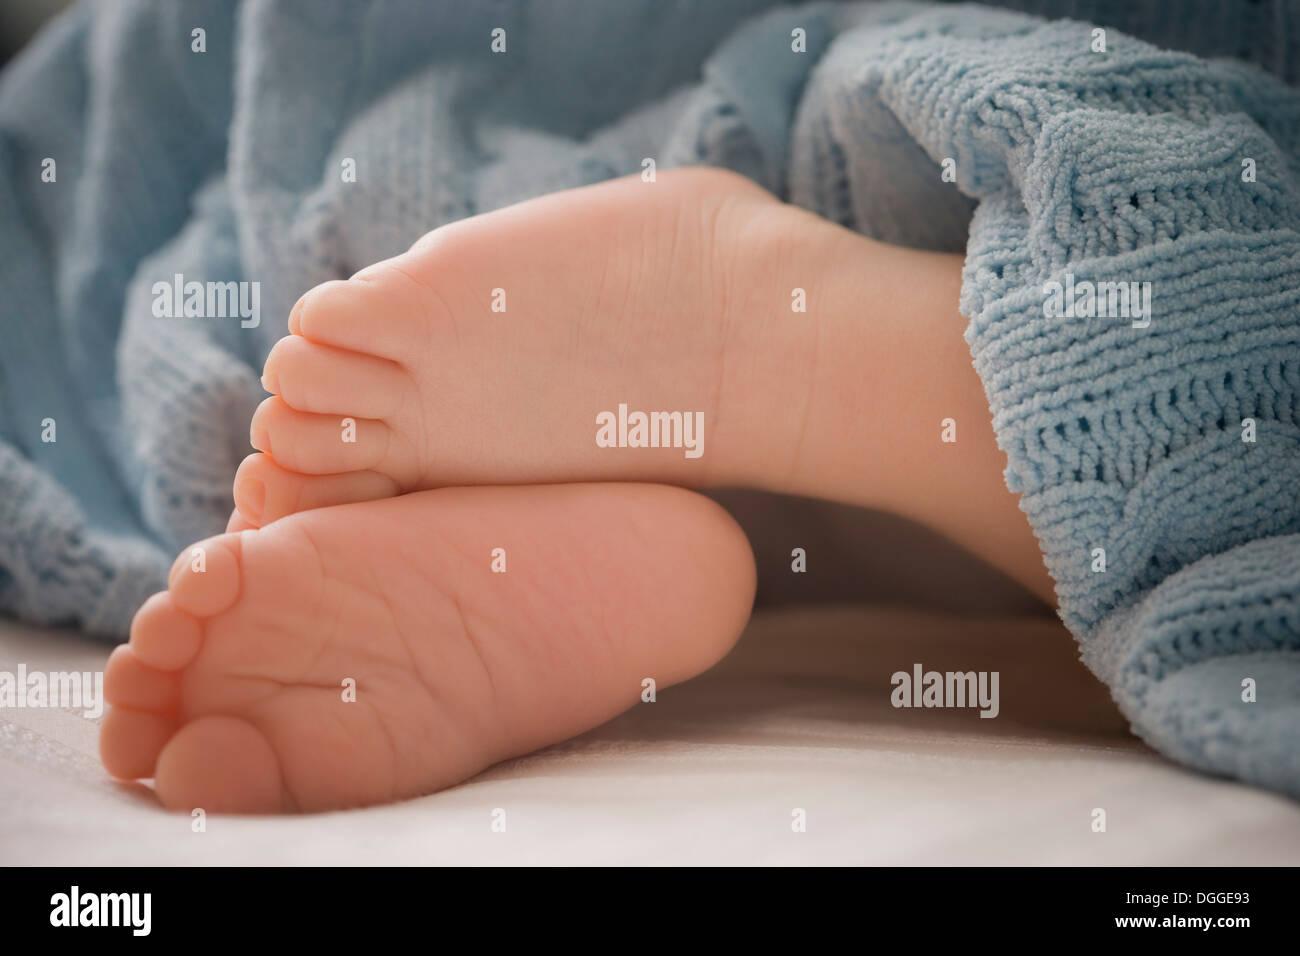 Baby boy 's feet, close up - Stock Image